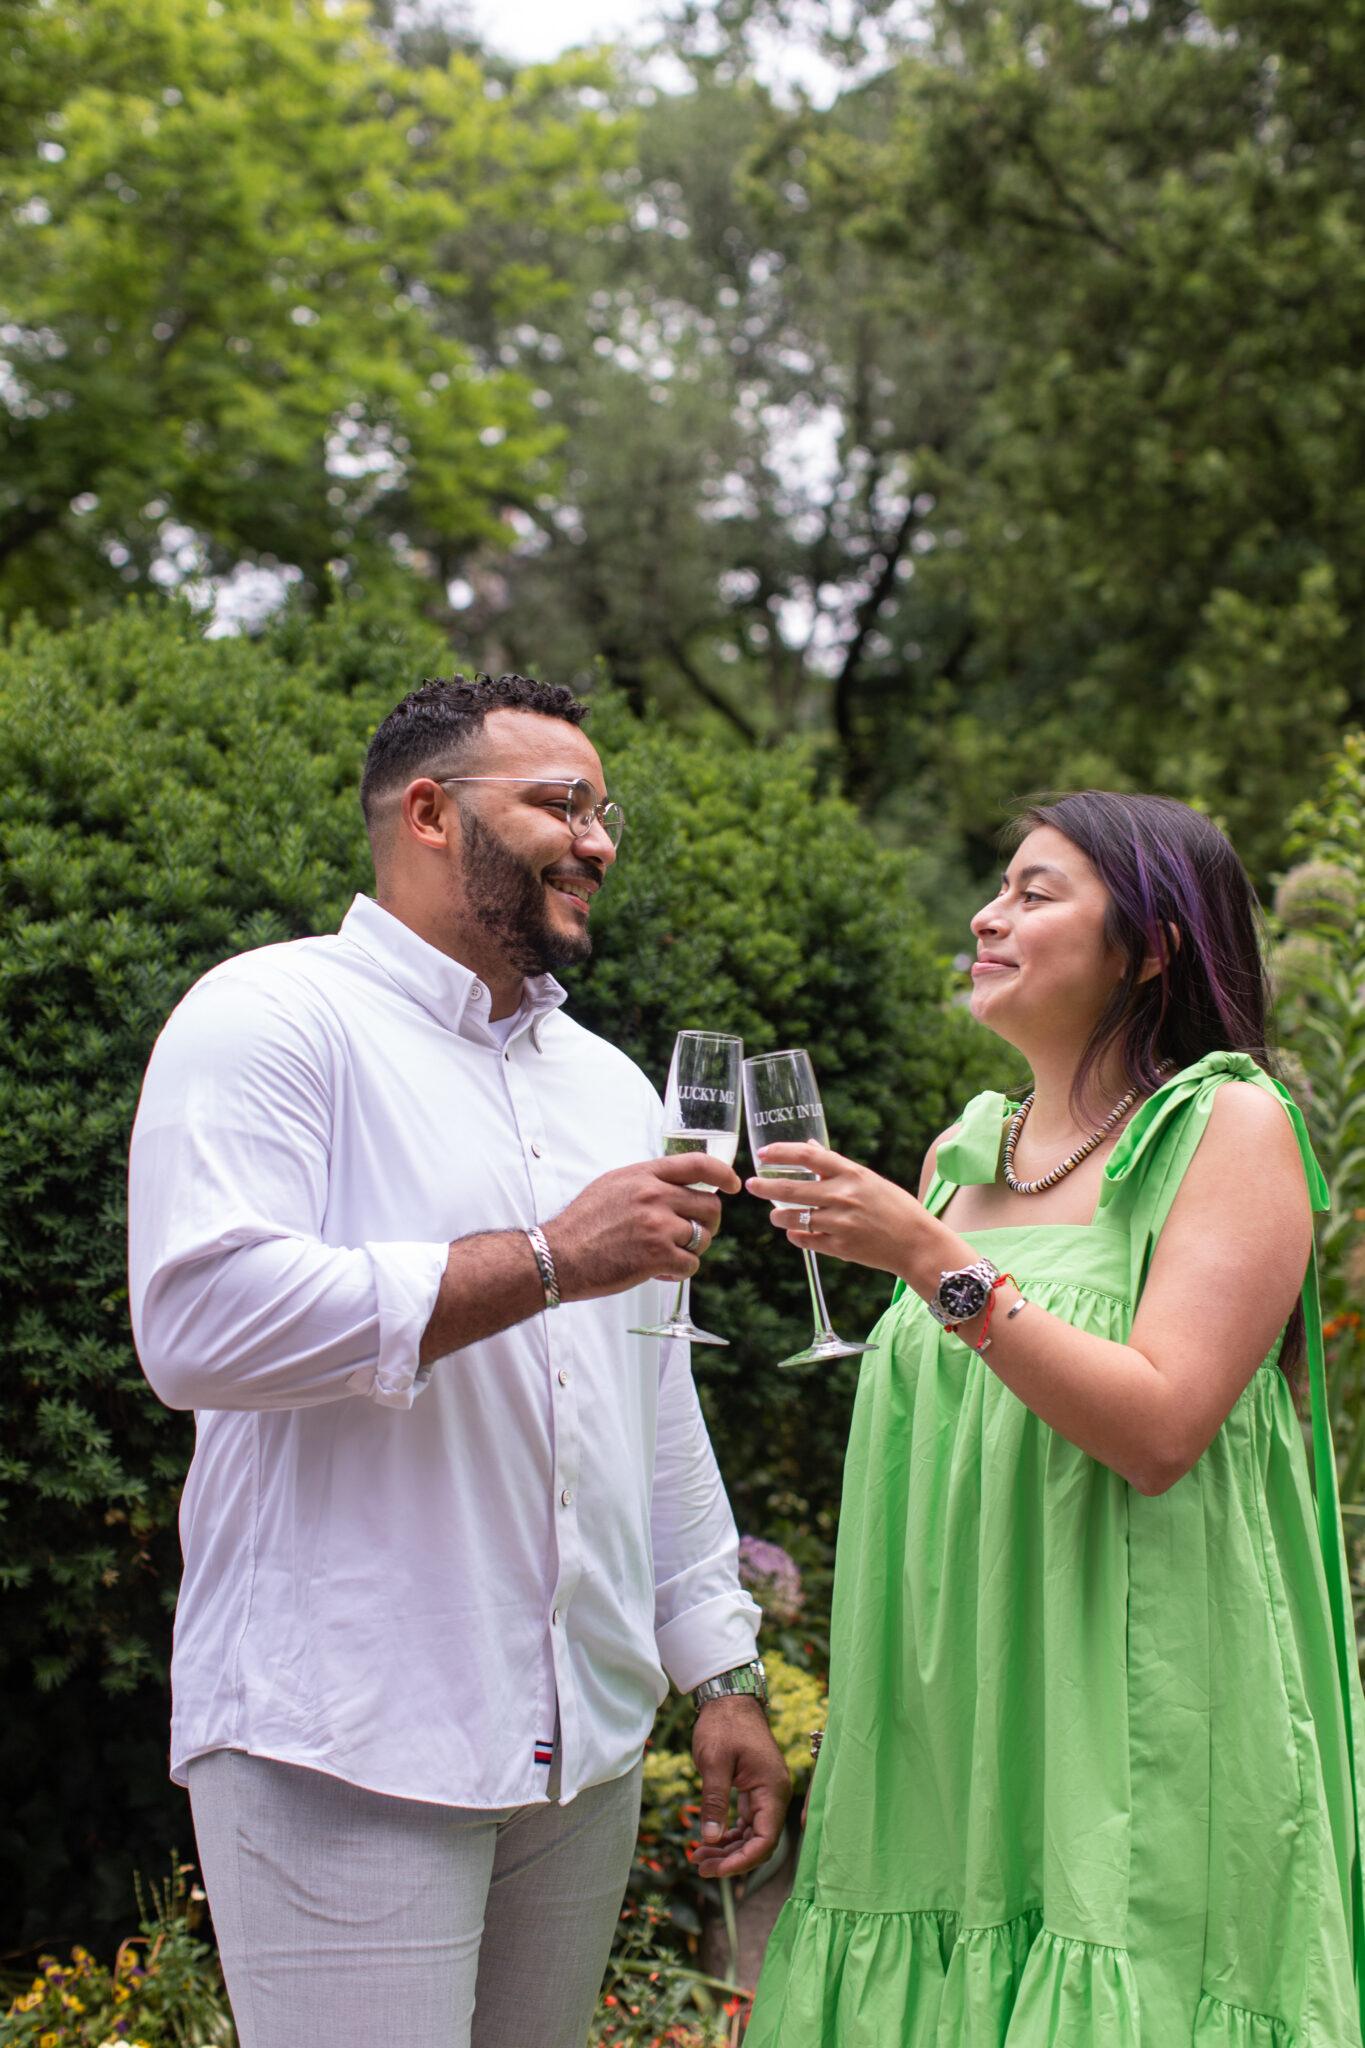 Newly engaged couple toasting champagne